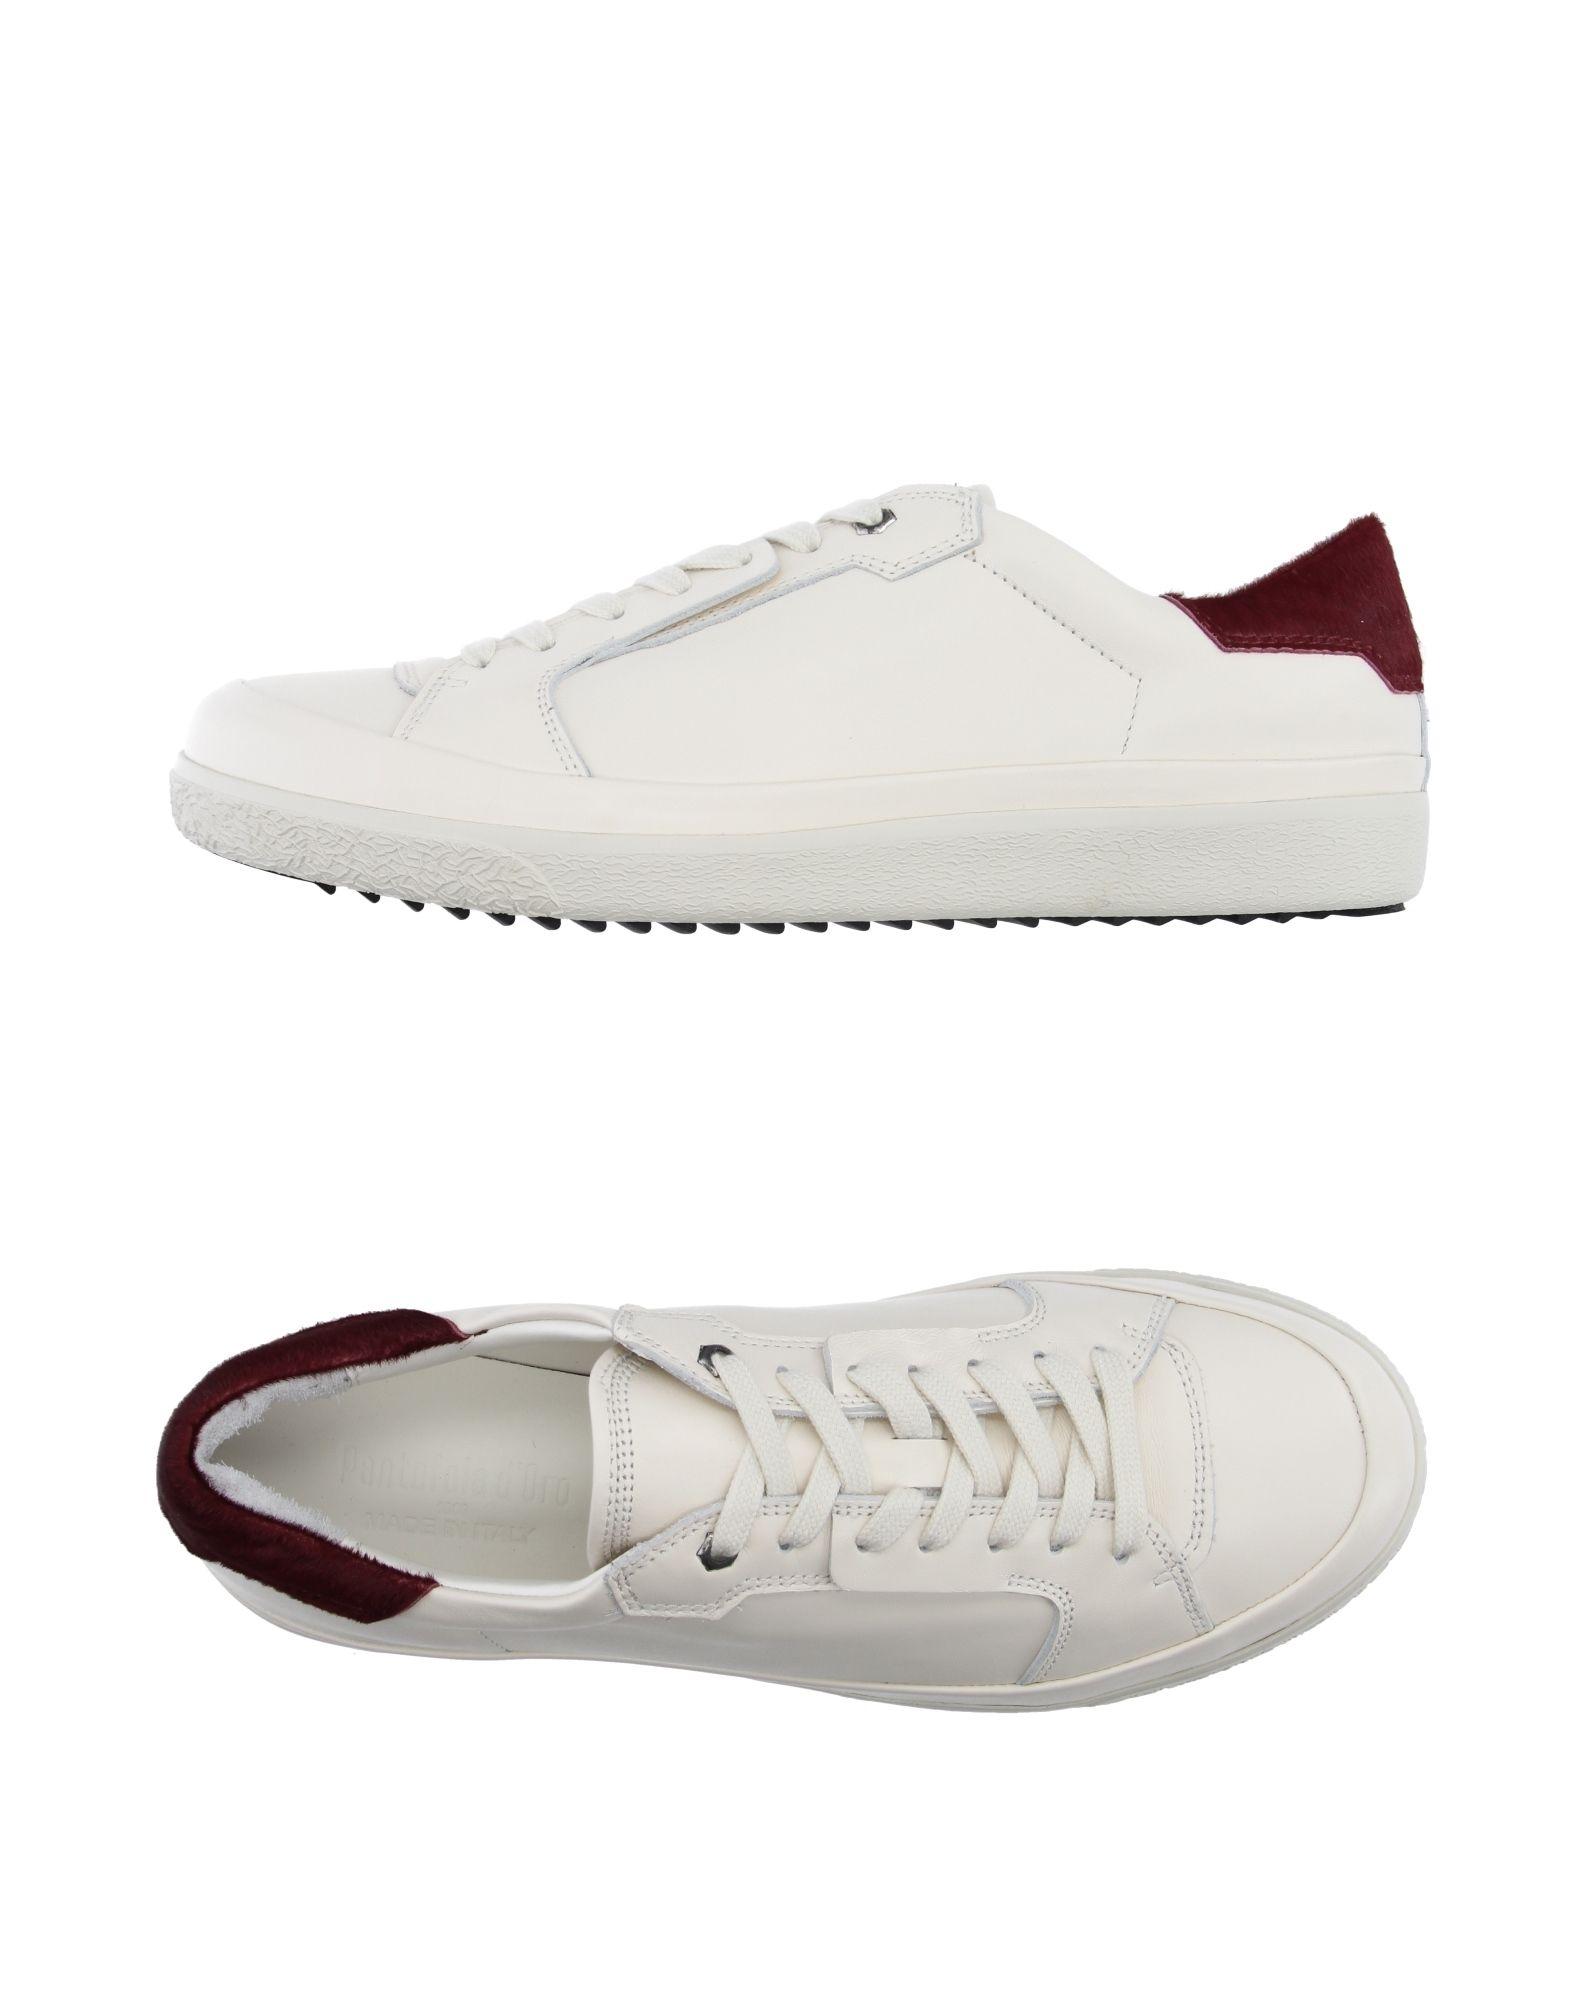 Pantofola D'oro Sneakers Qualität Herren  11100053TP Gute Qualität Sneakers beliebte Schuhe e3f5f7